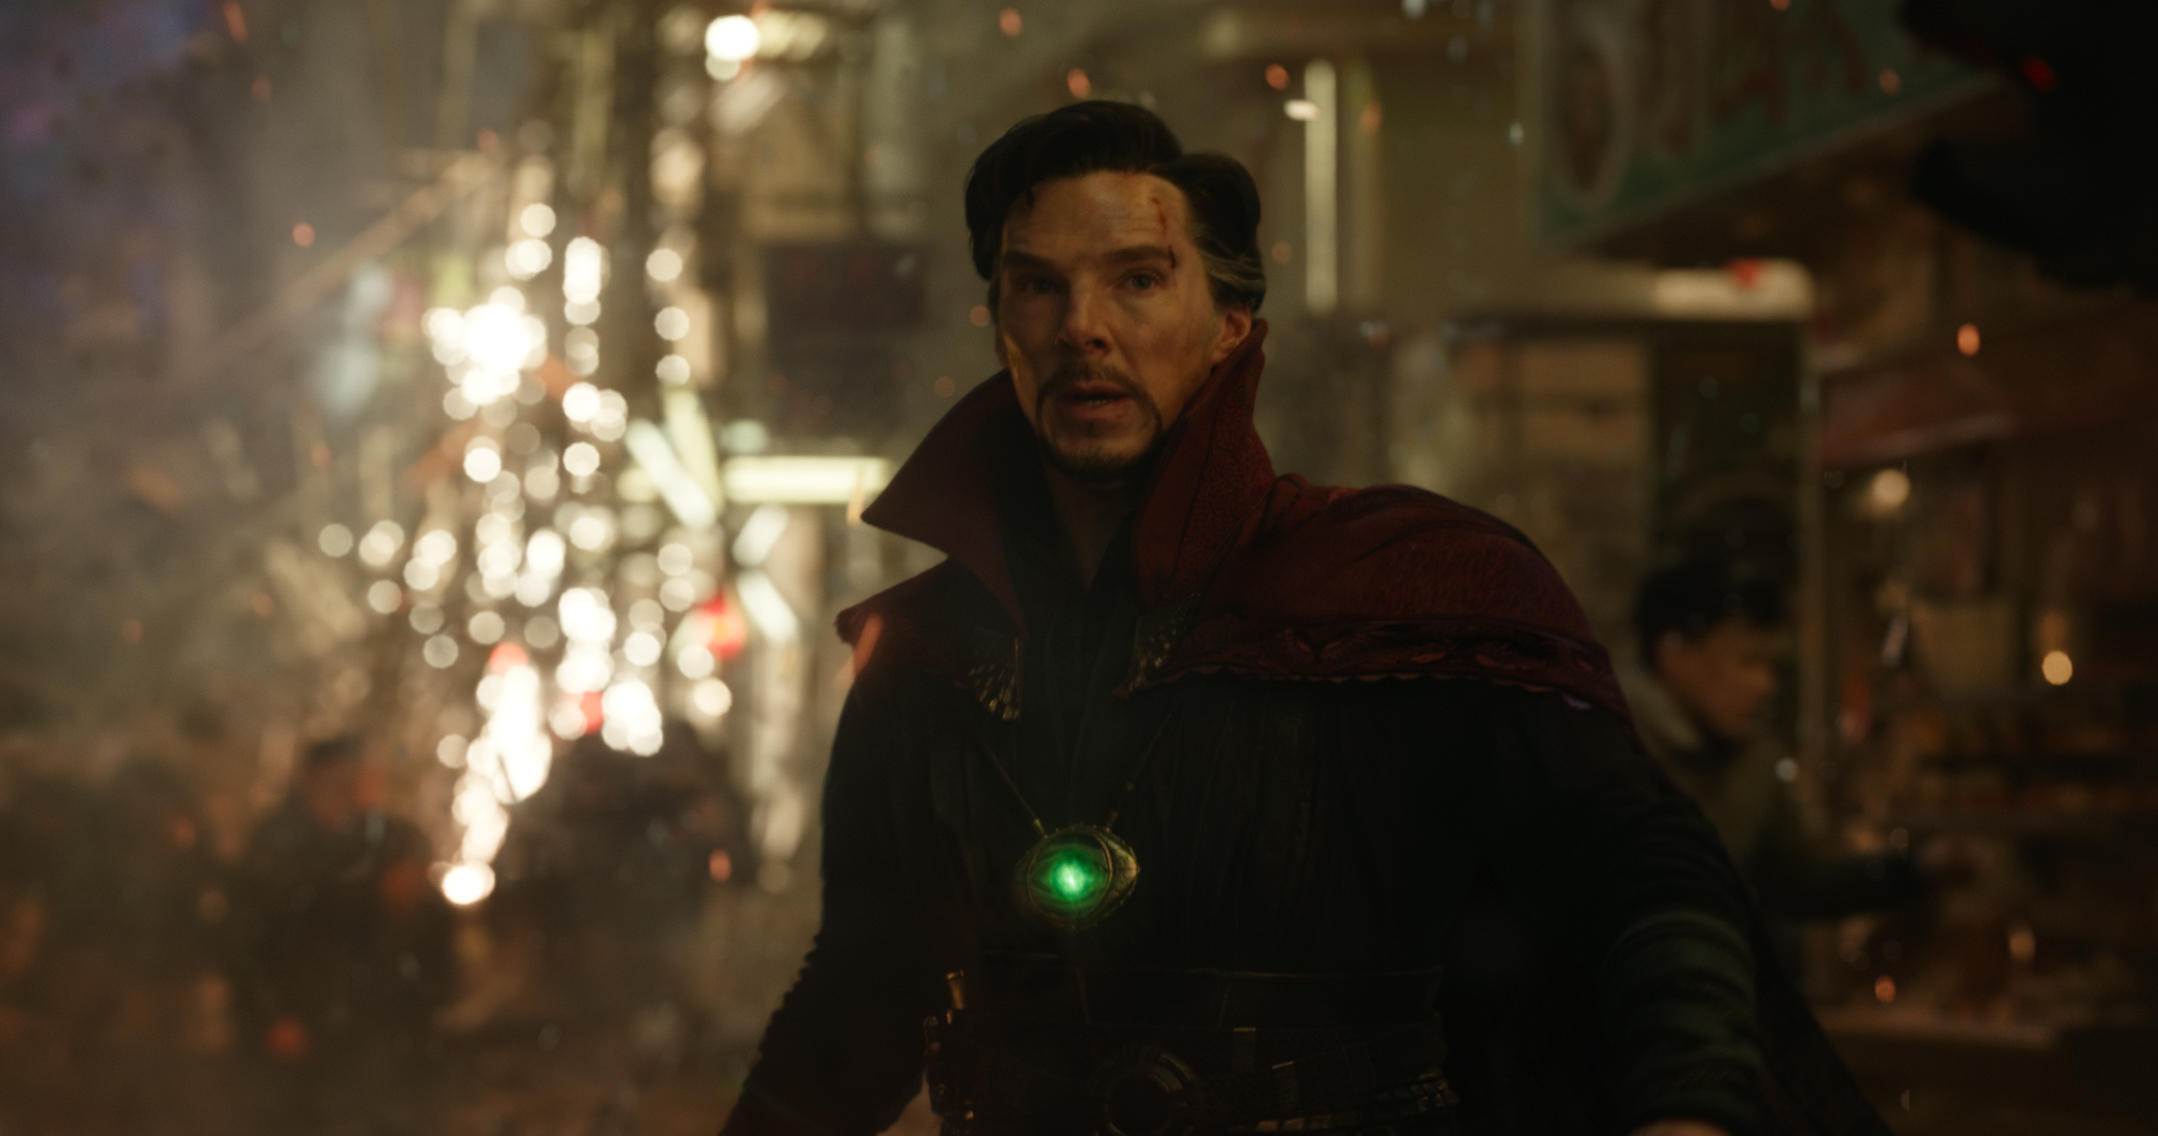 'Doctor Strange' is now Marvel's Most Successful Solo Origin Film